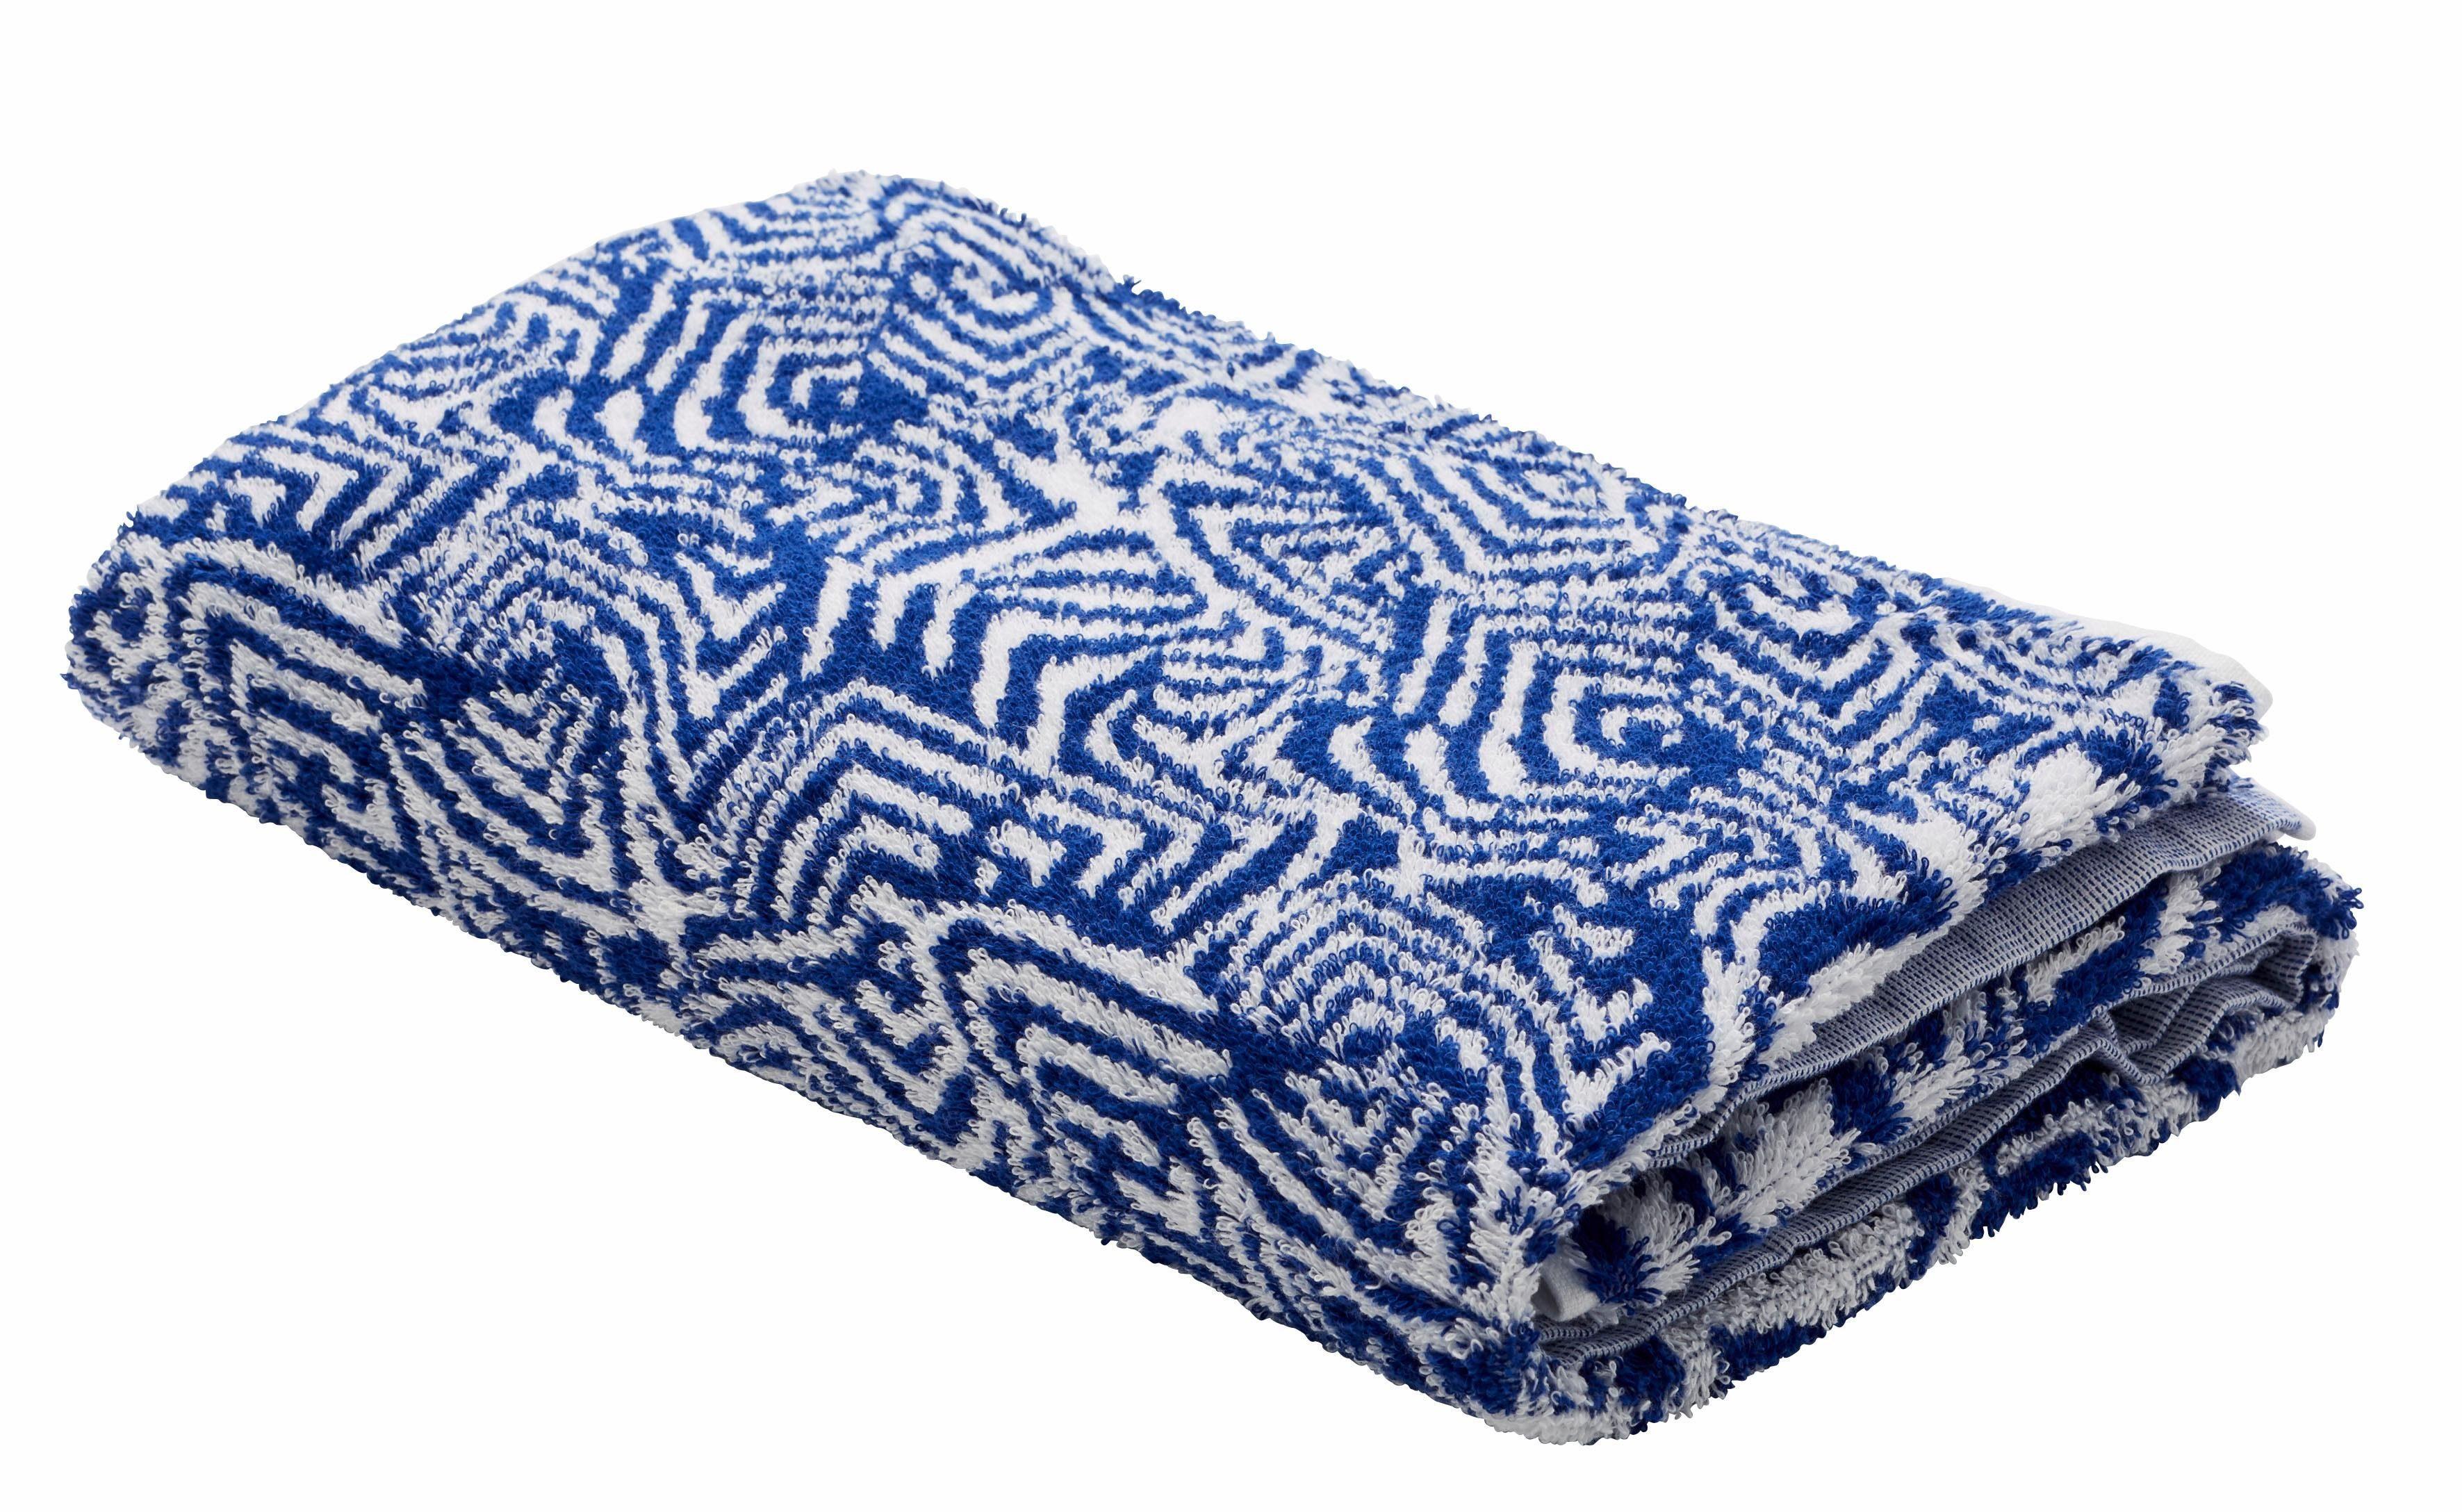 Badetuch, GMK Home & Living, »Serie Blue waves«, mit modernem Muster